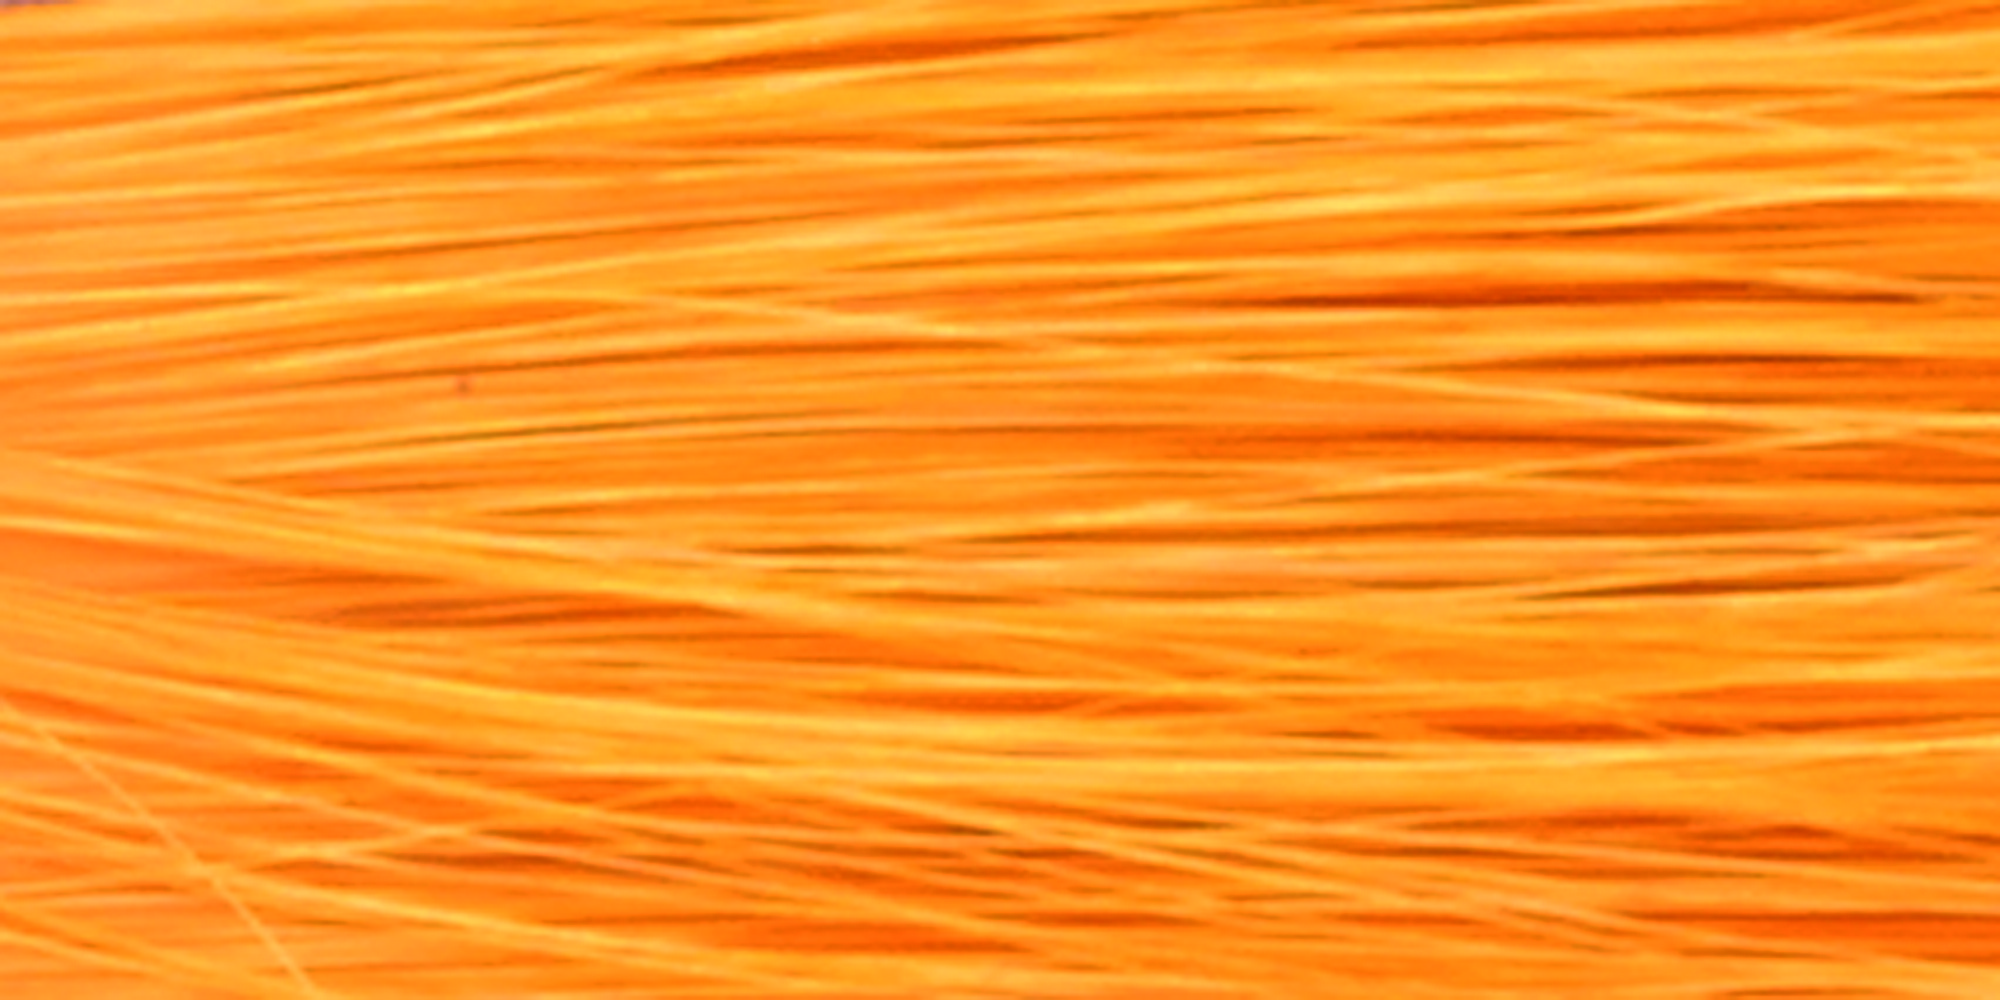 Stargazer-Baby-Hair-Extension-Synthetic-Clip-on-Streak-Various-Colors-43cm thumbnail 25